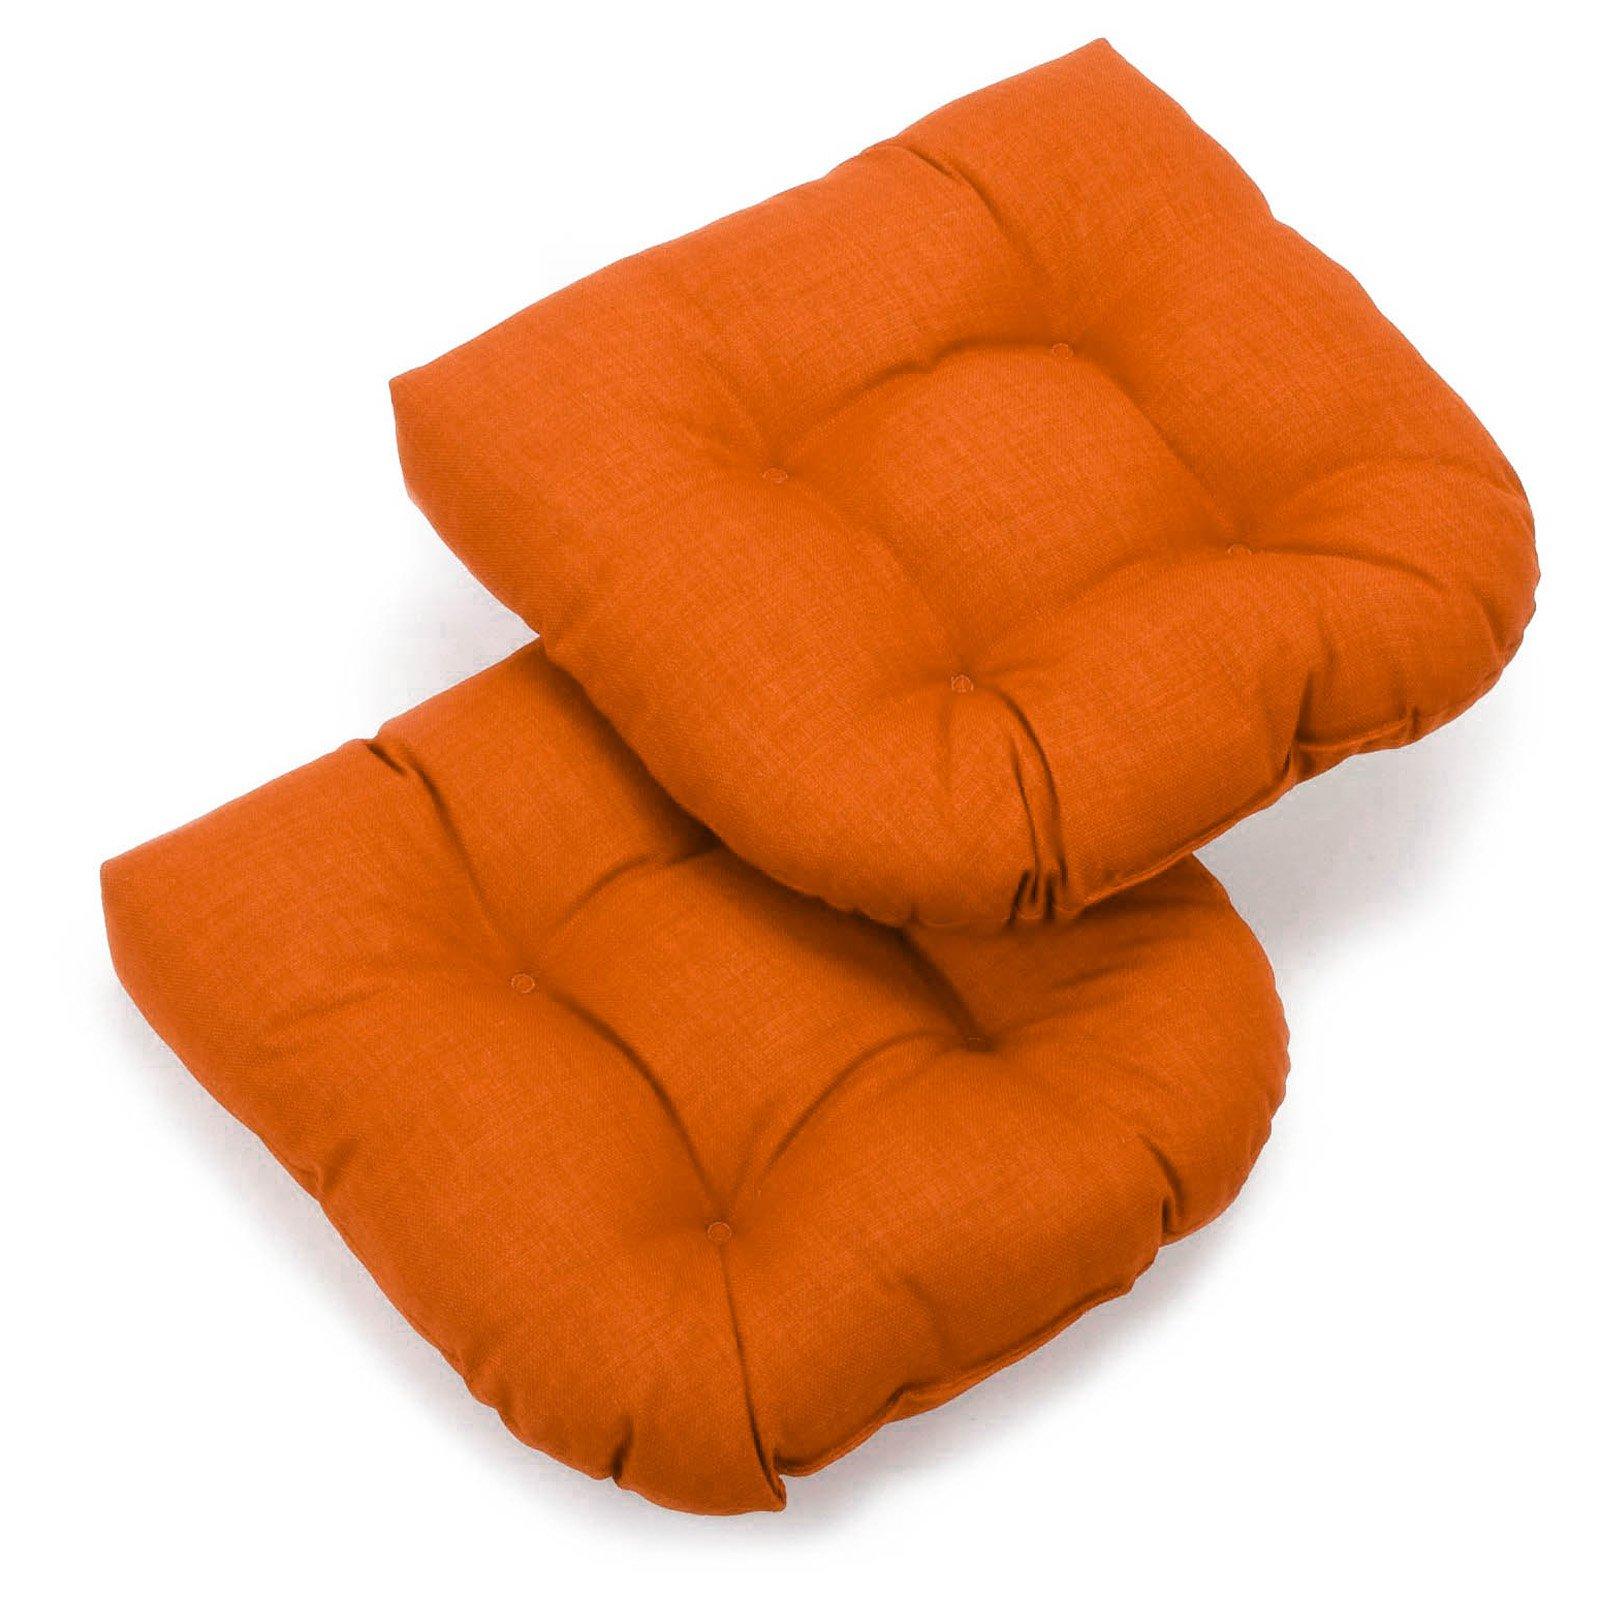 Blazing Needles 19 x 19 in. Patio Chair Cushion - Set of 2